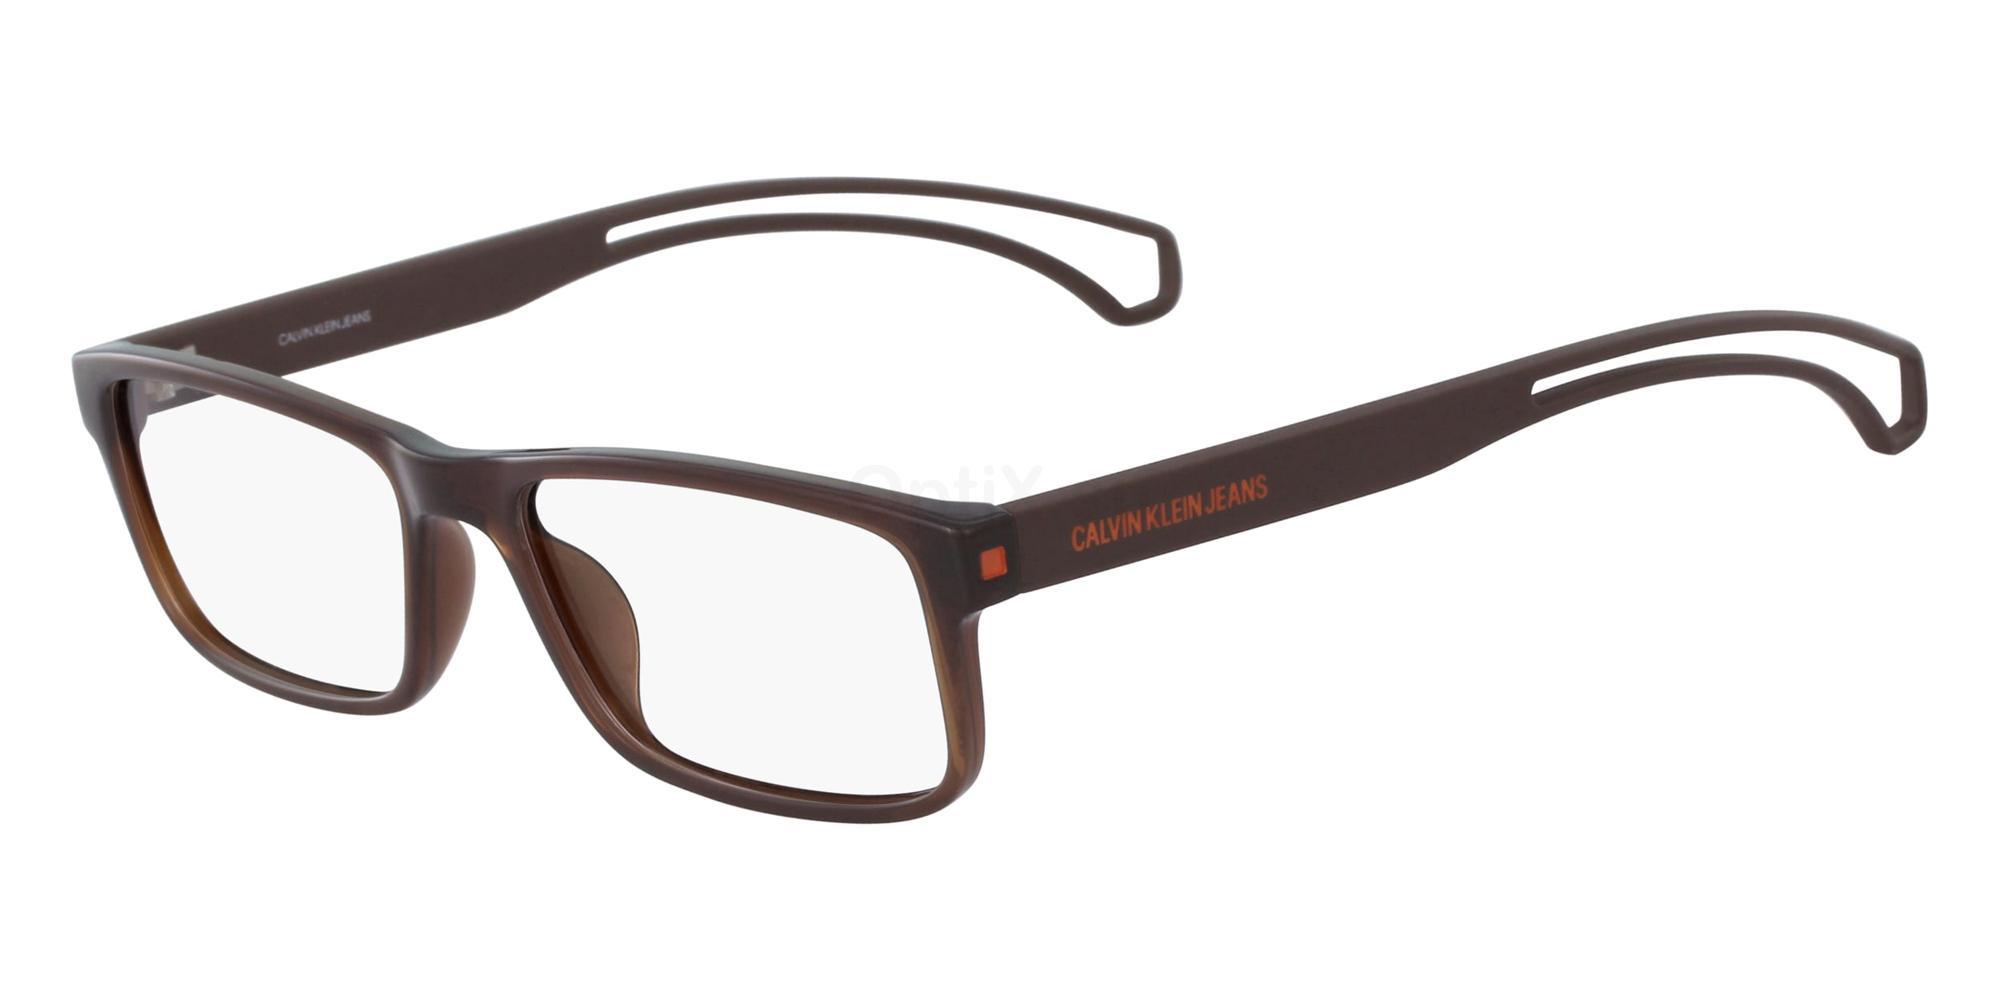 201 CKJ19509 Glasses, Calvin Klein Jeans